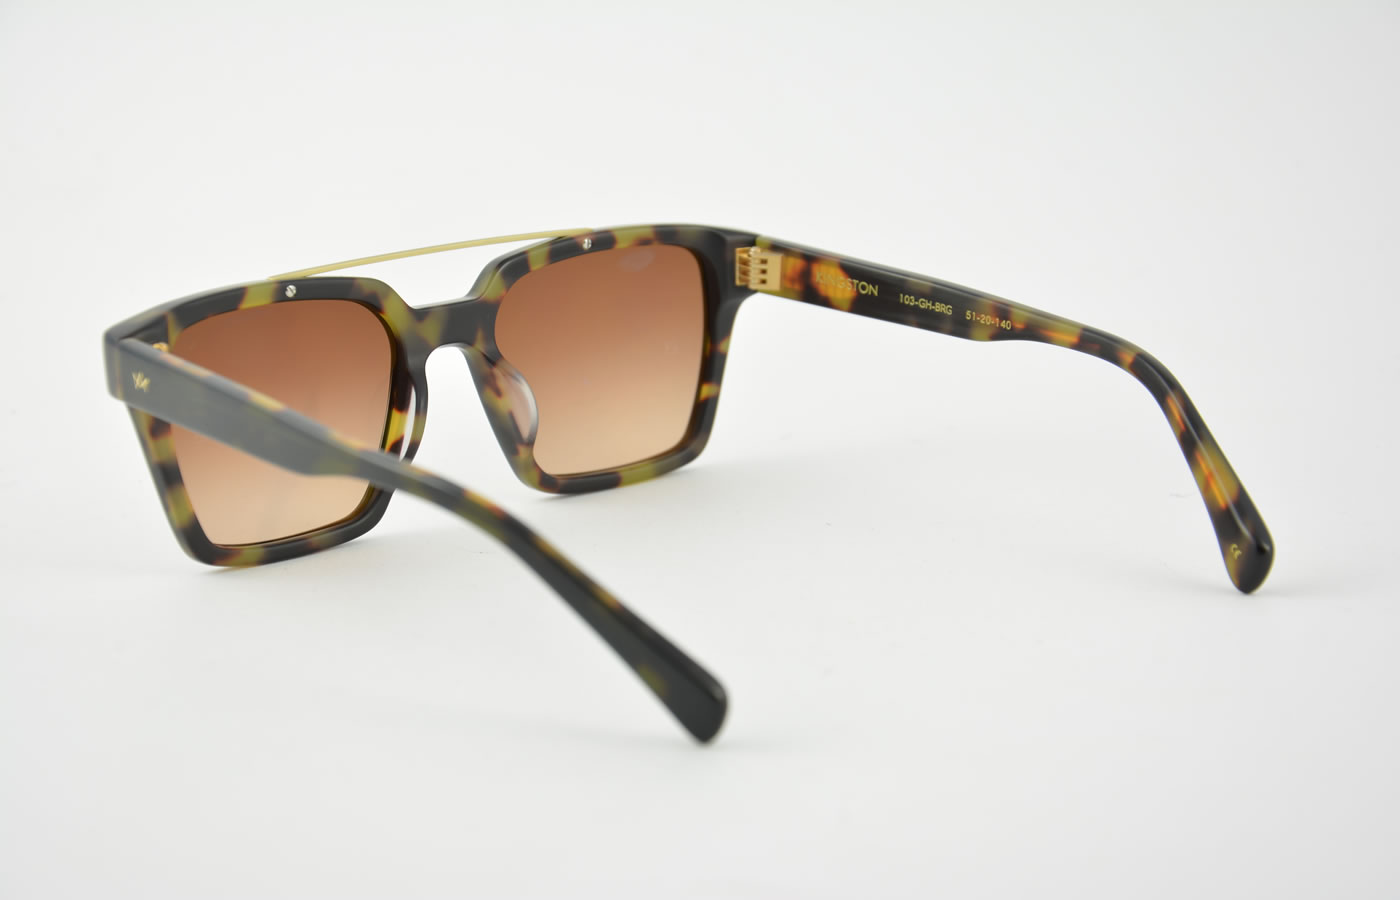 Glasses Frames Kingston : AM Eyewear - Kingston - Green Havana